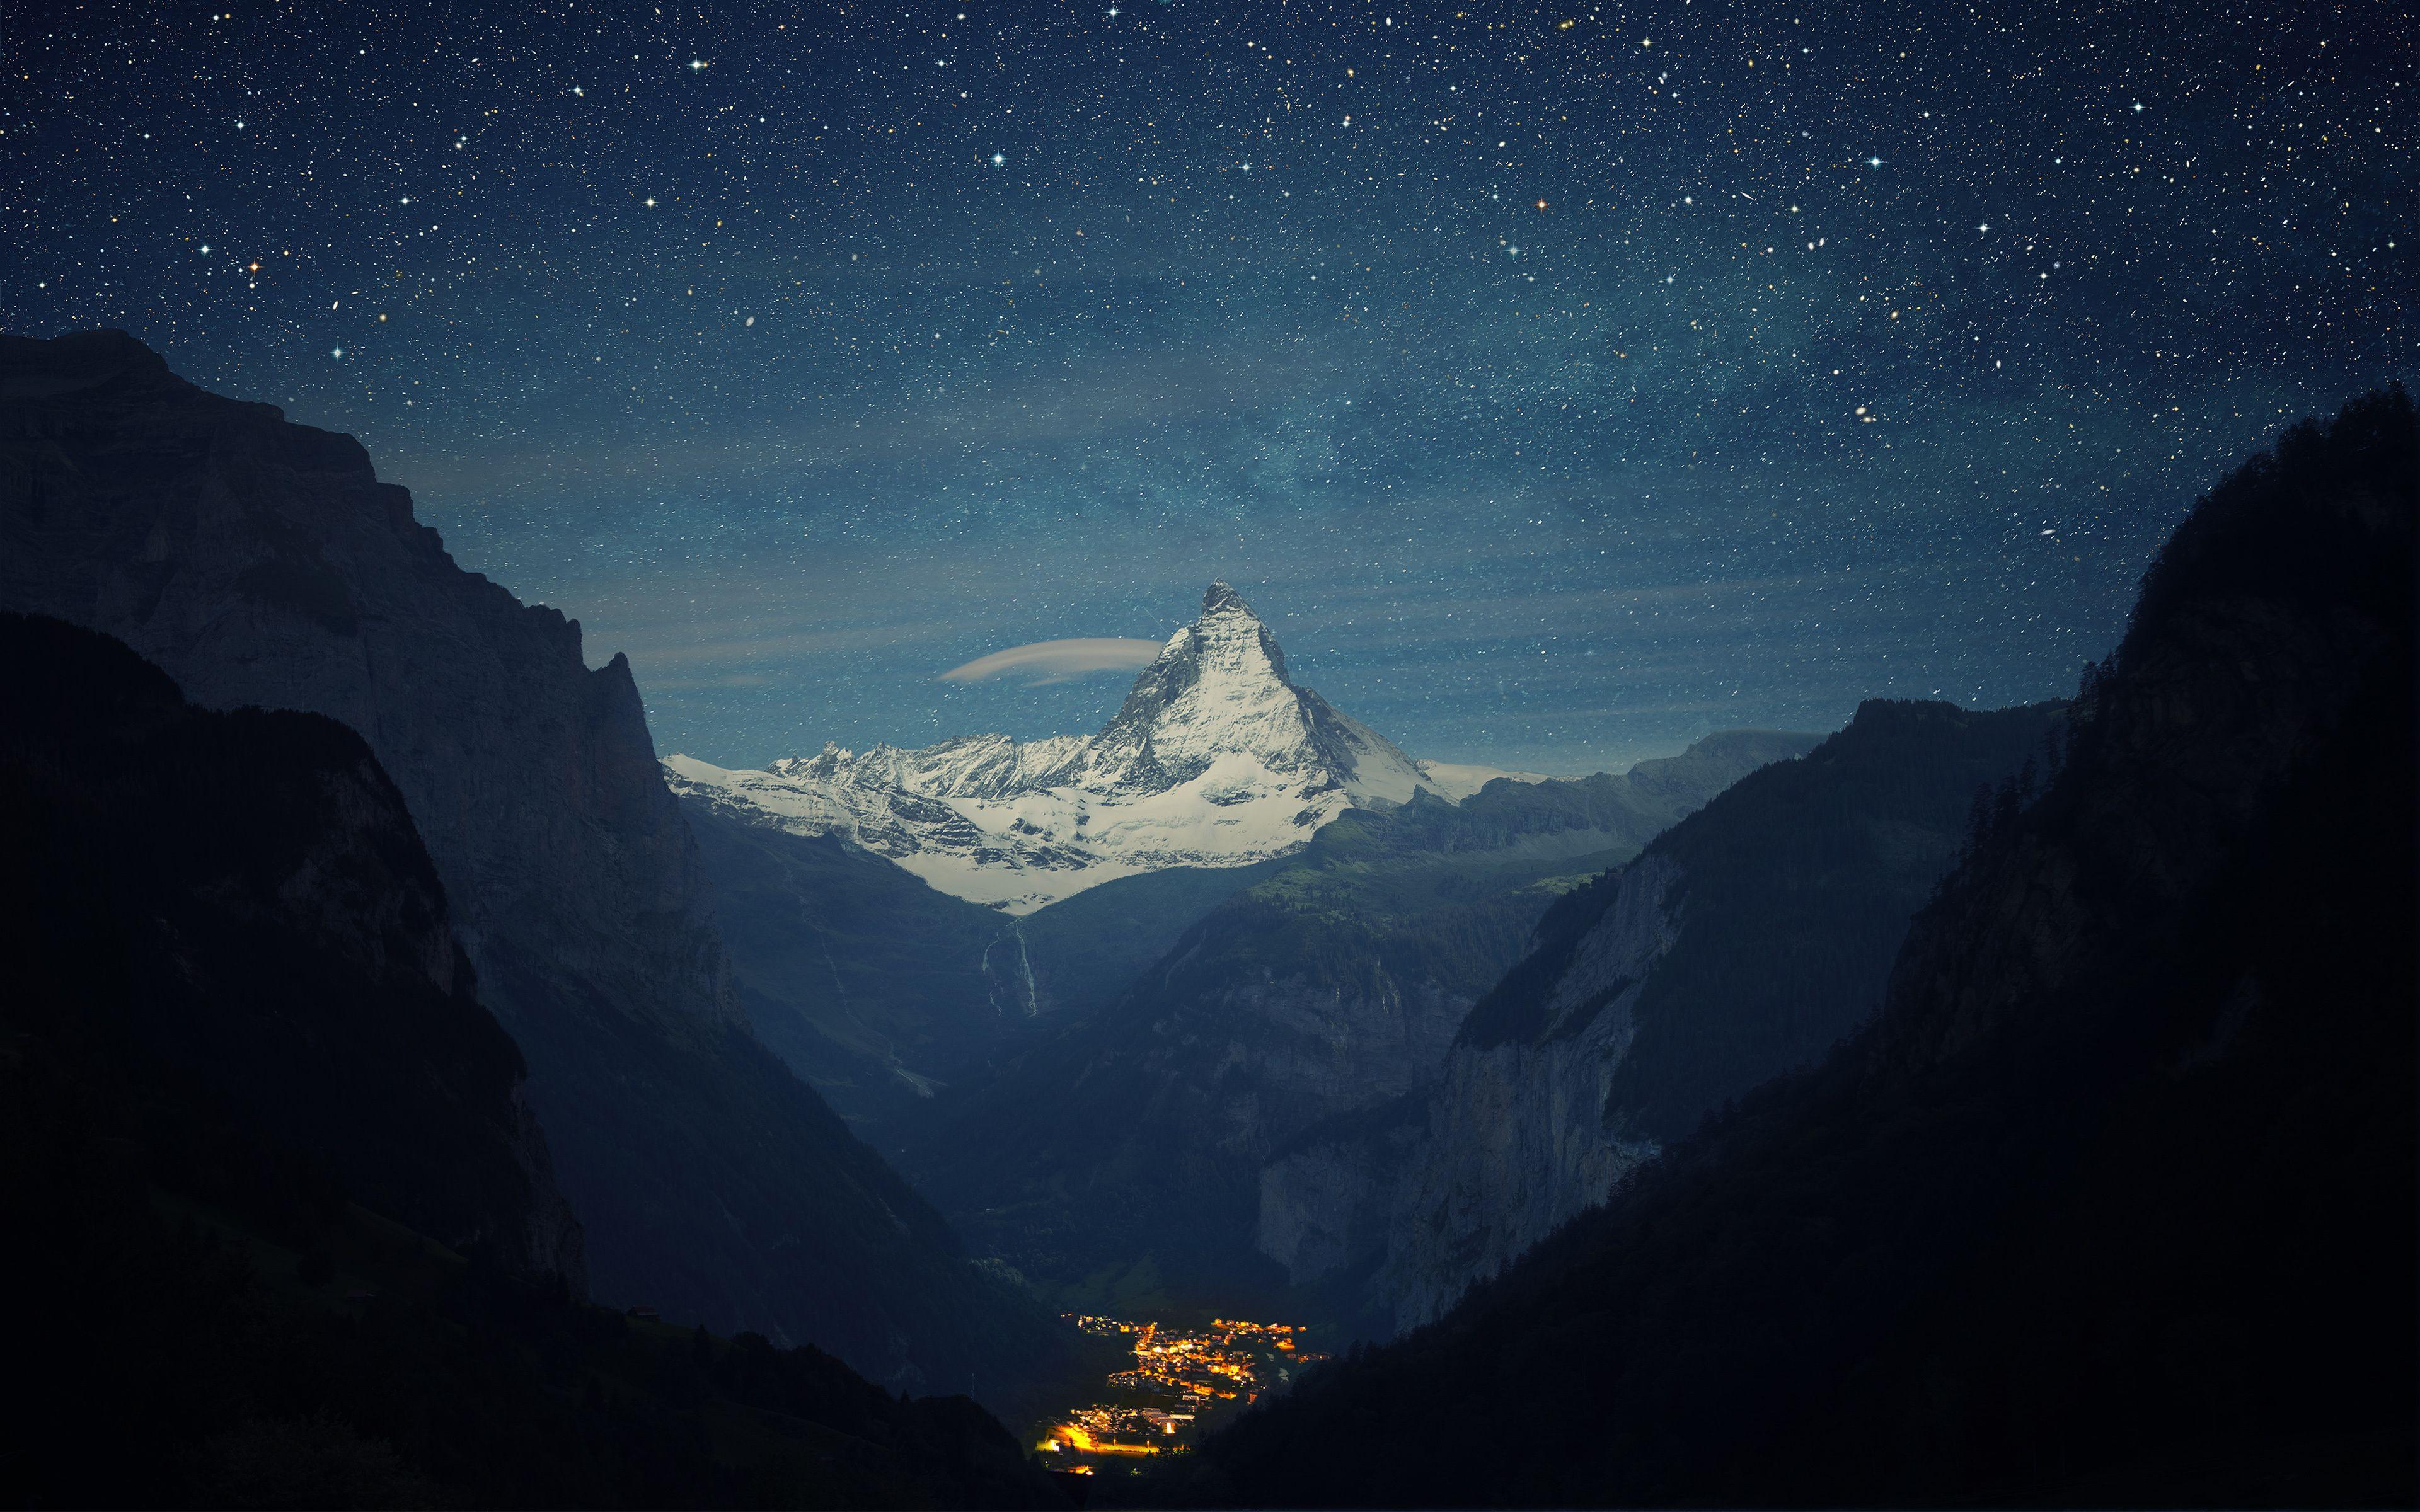 Switzerland Alps Mountains Night Beautiful Landscape Nature Wallpaper Mountain Wallpaper Tree Hd Wallpaper